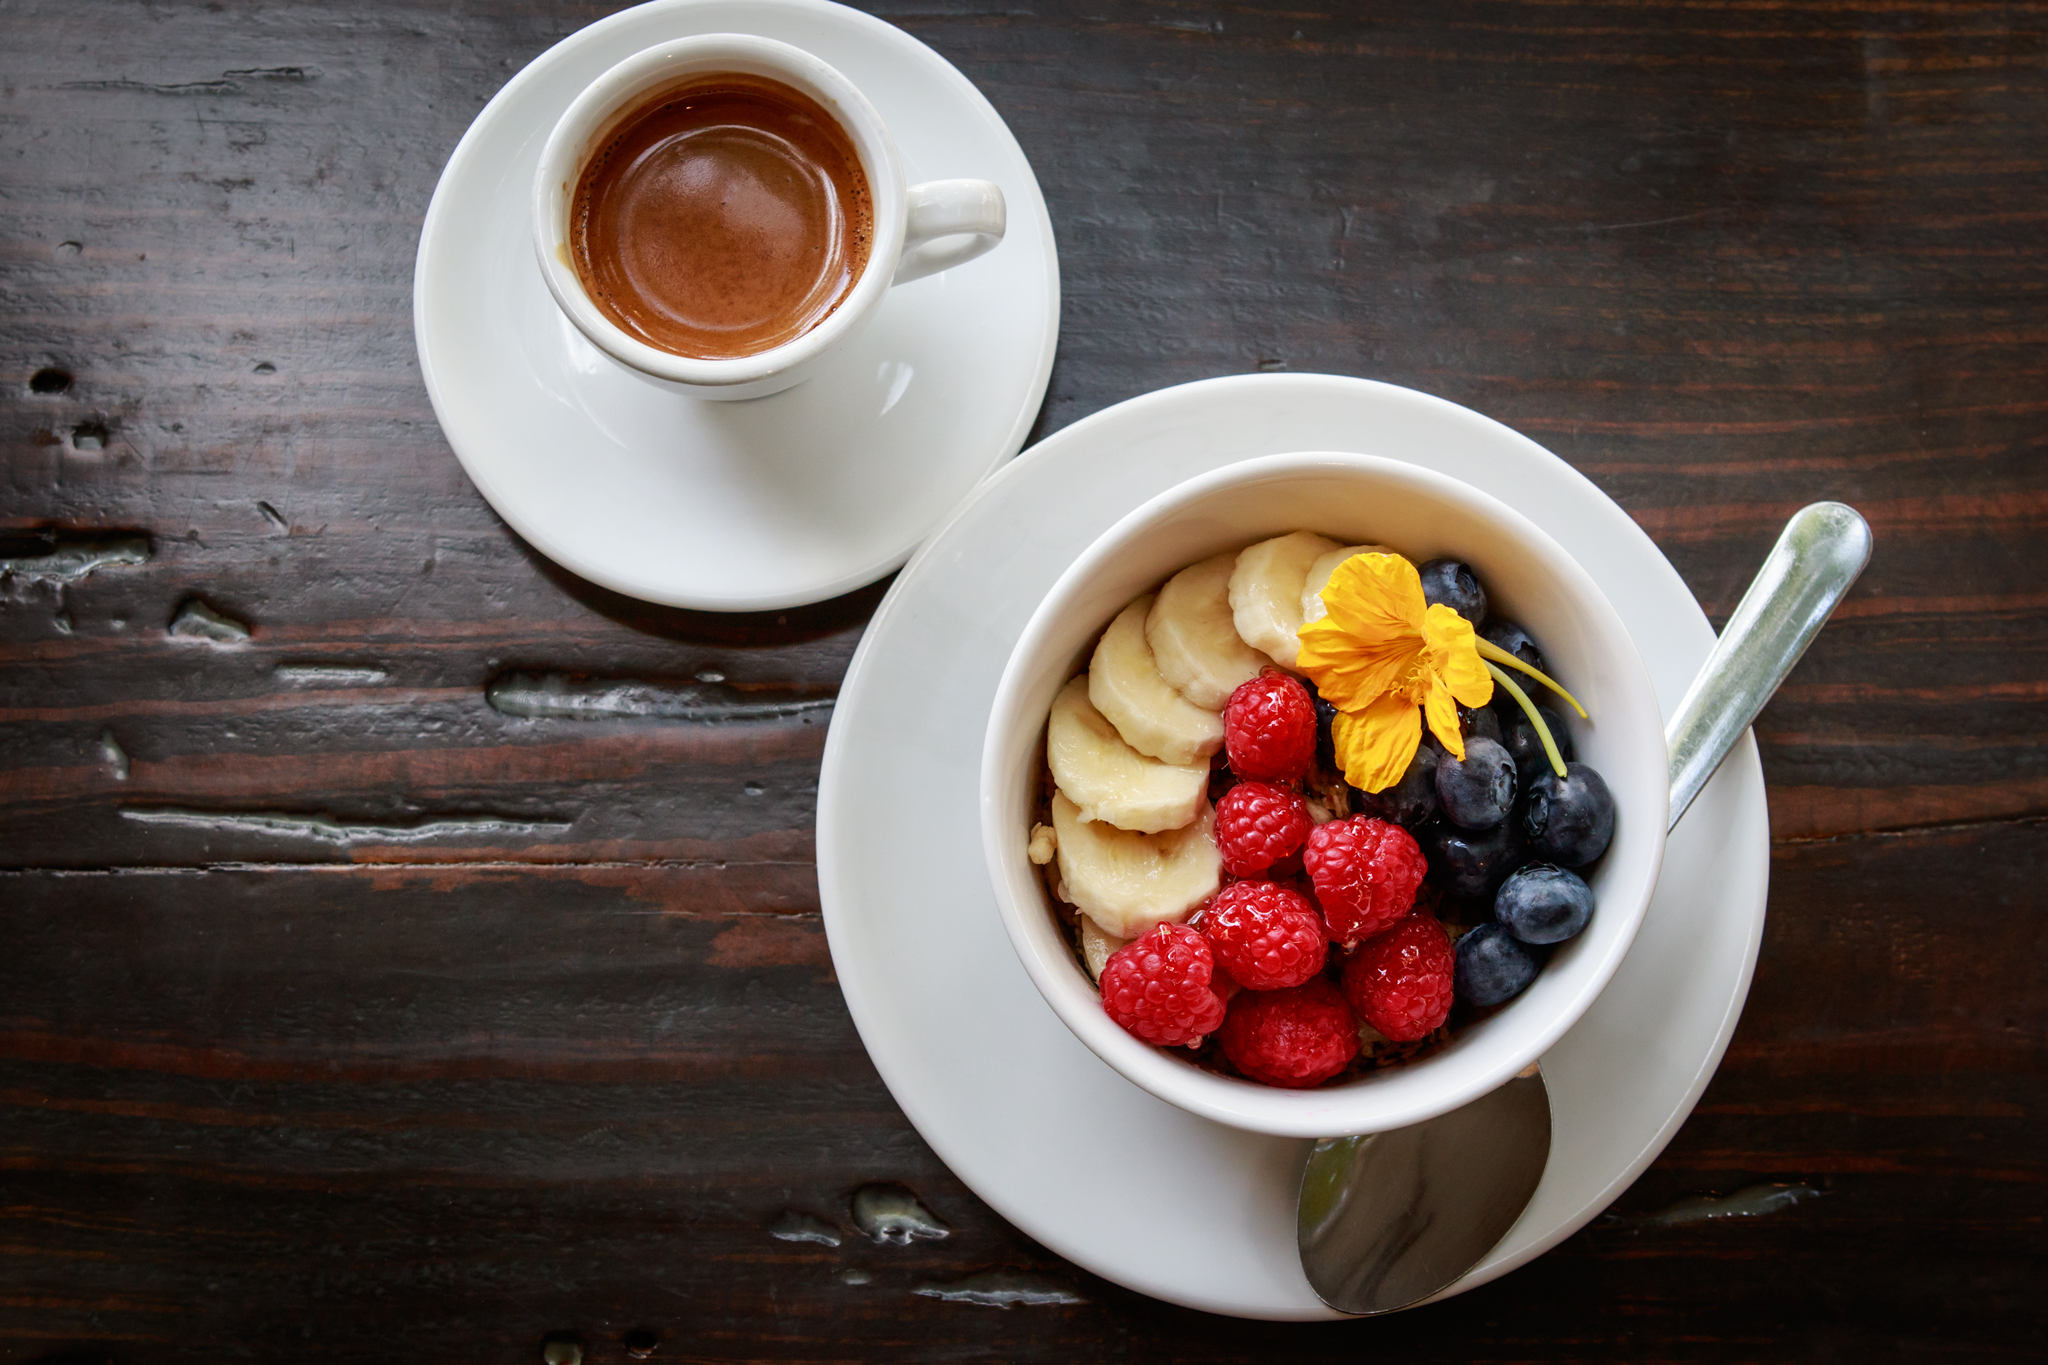 BreakfastBowl6